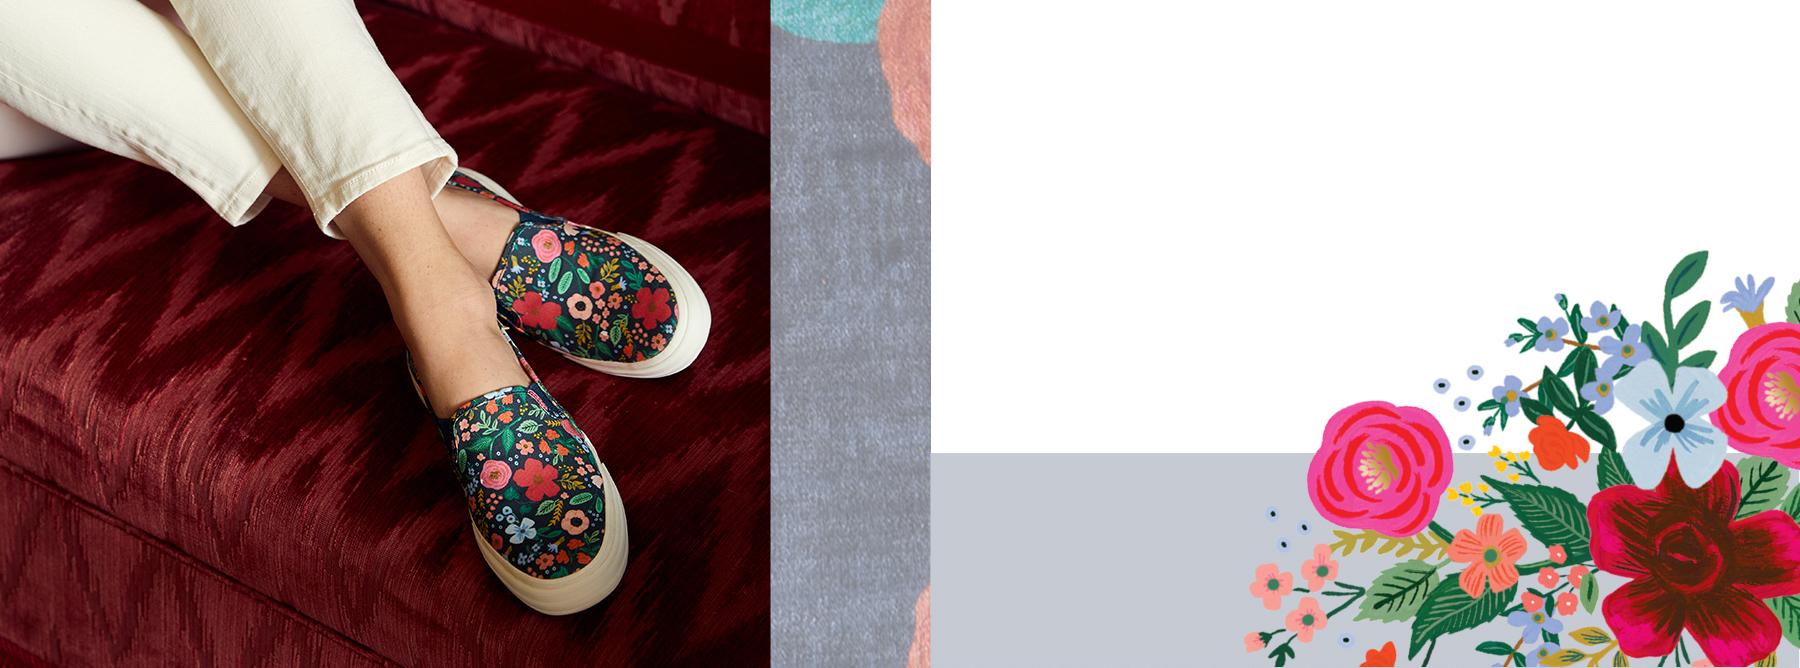 A pair of Kickstart Wild Rose's being playfully worn.